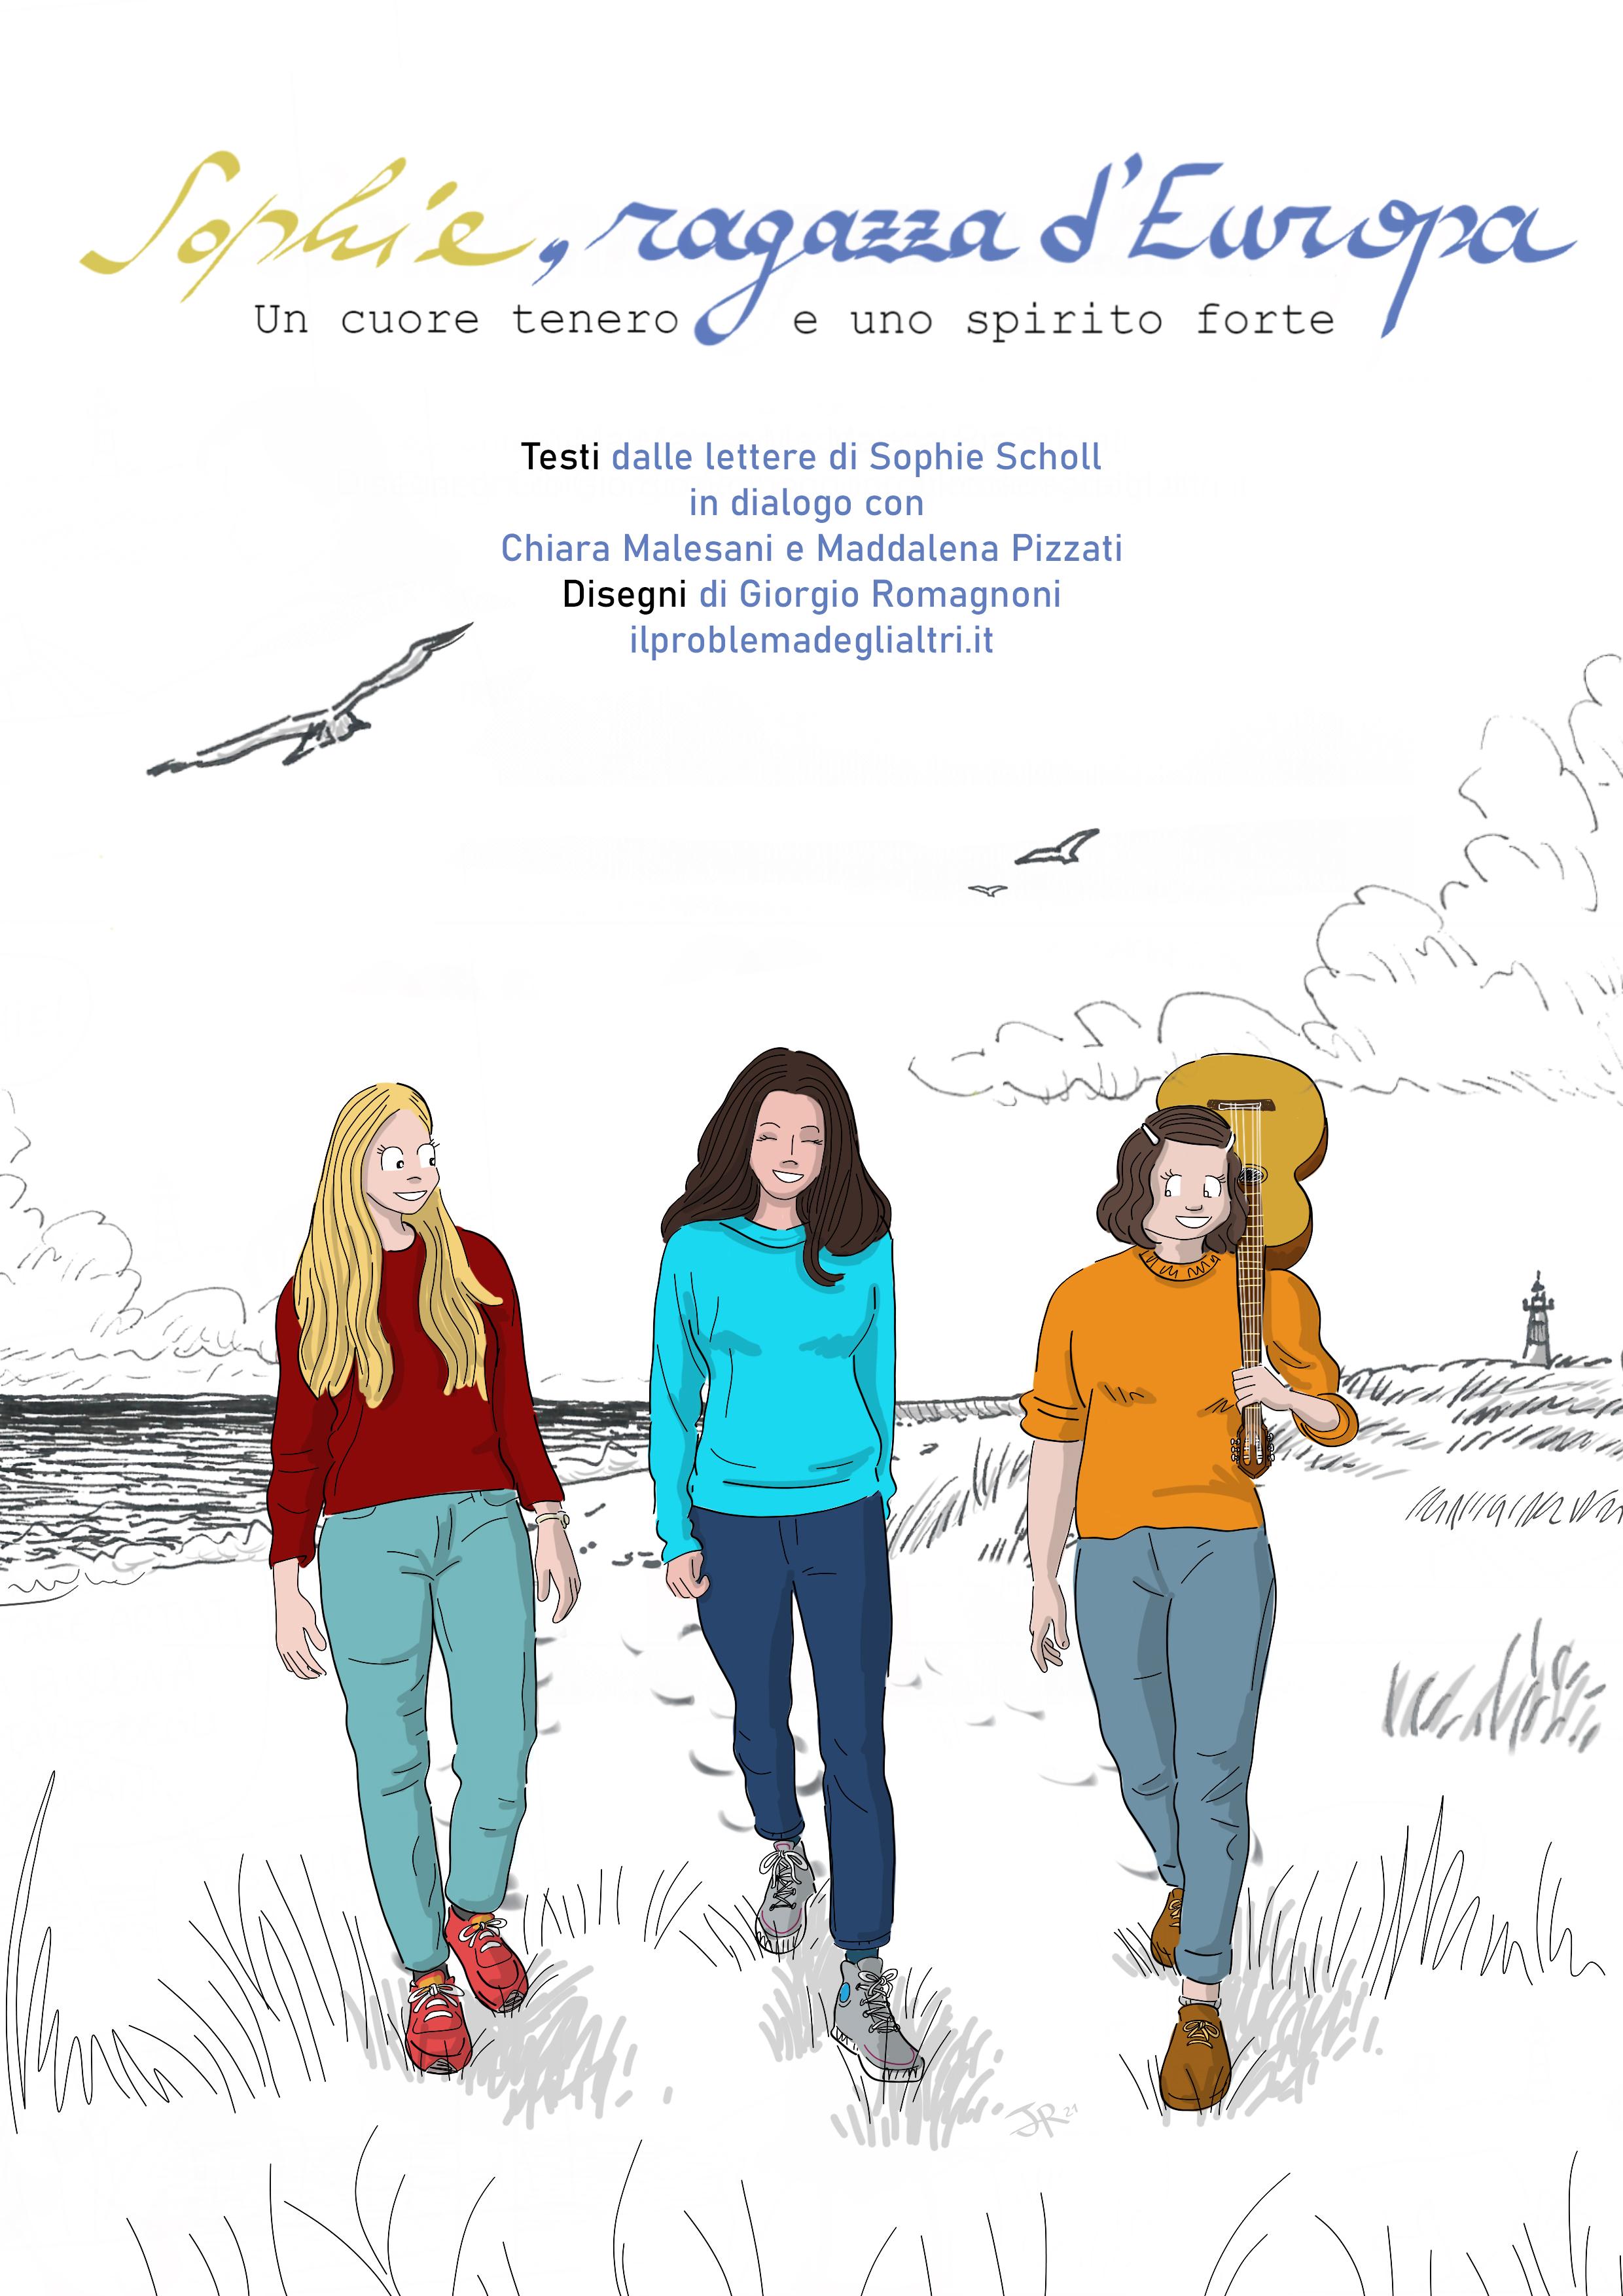 La copertina della grafic novel